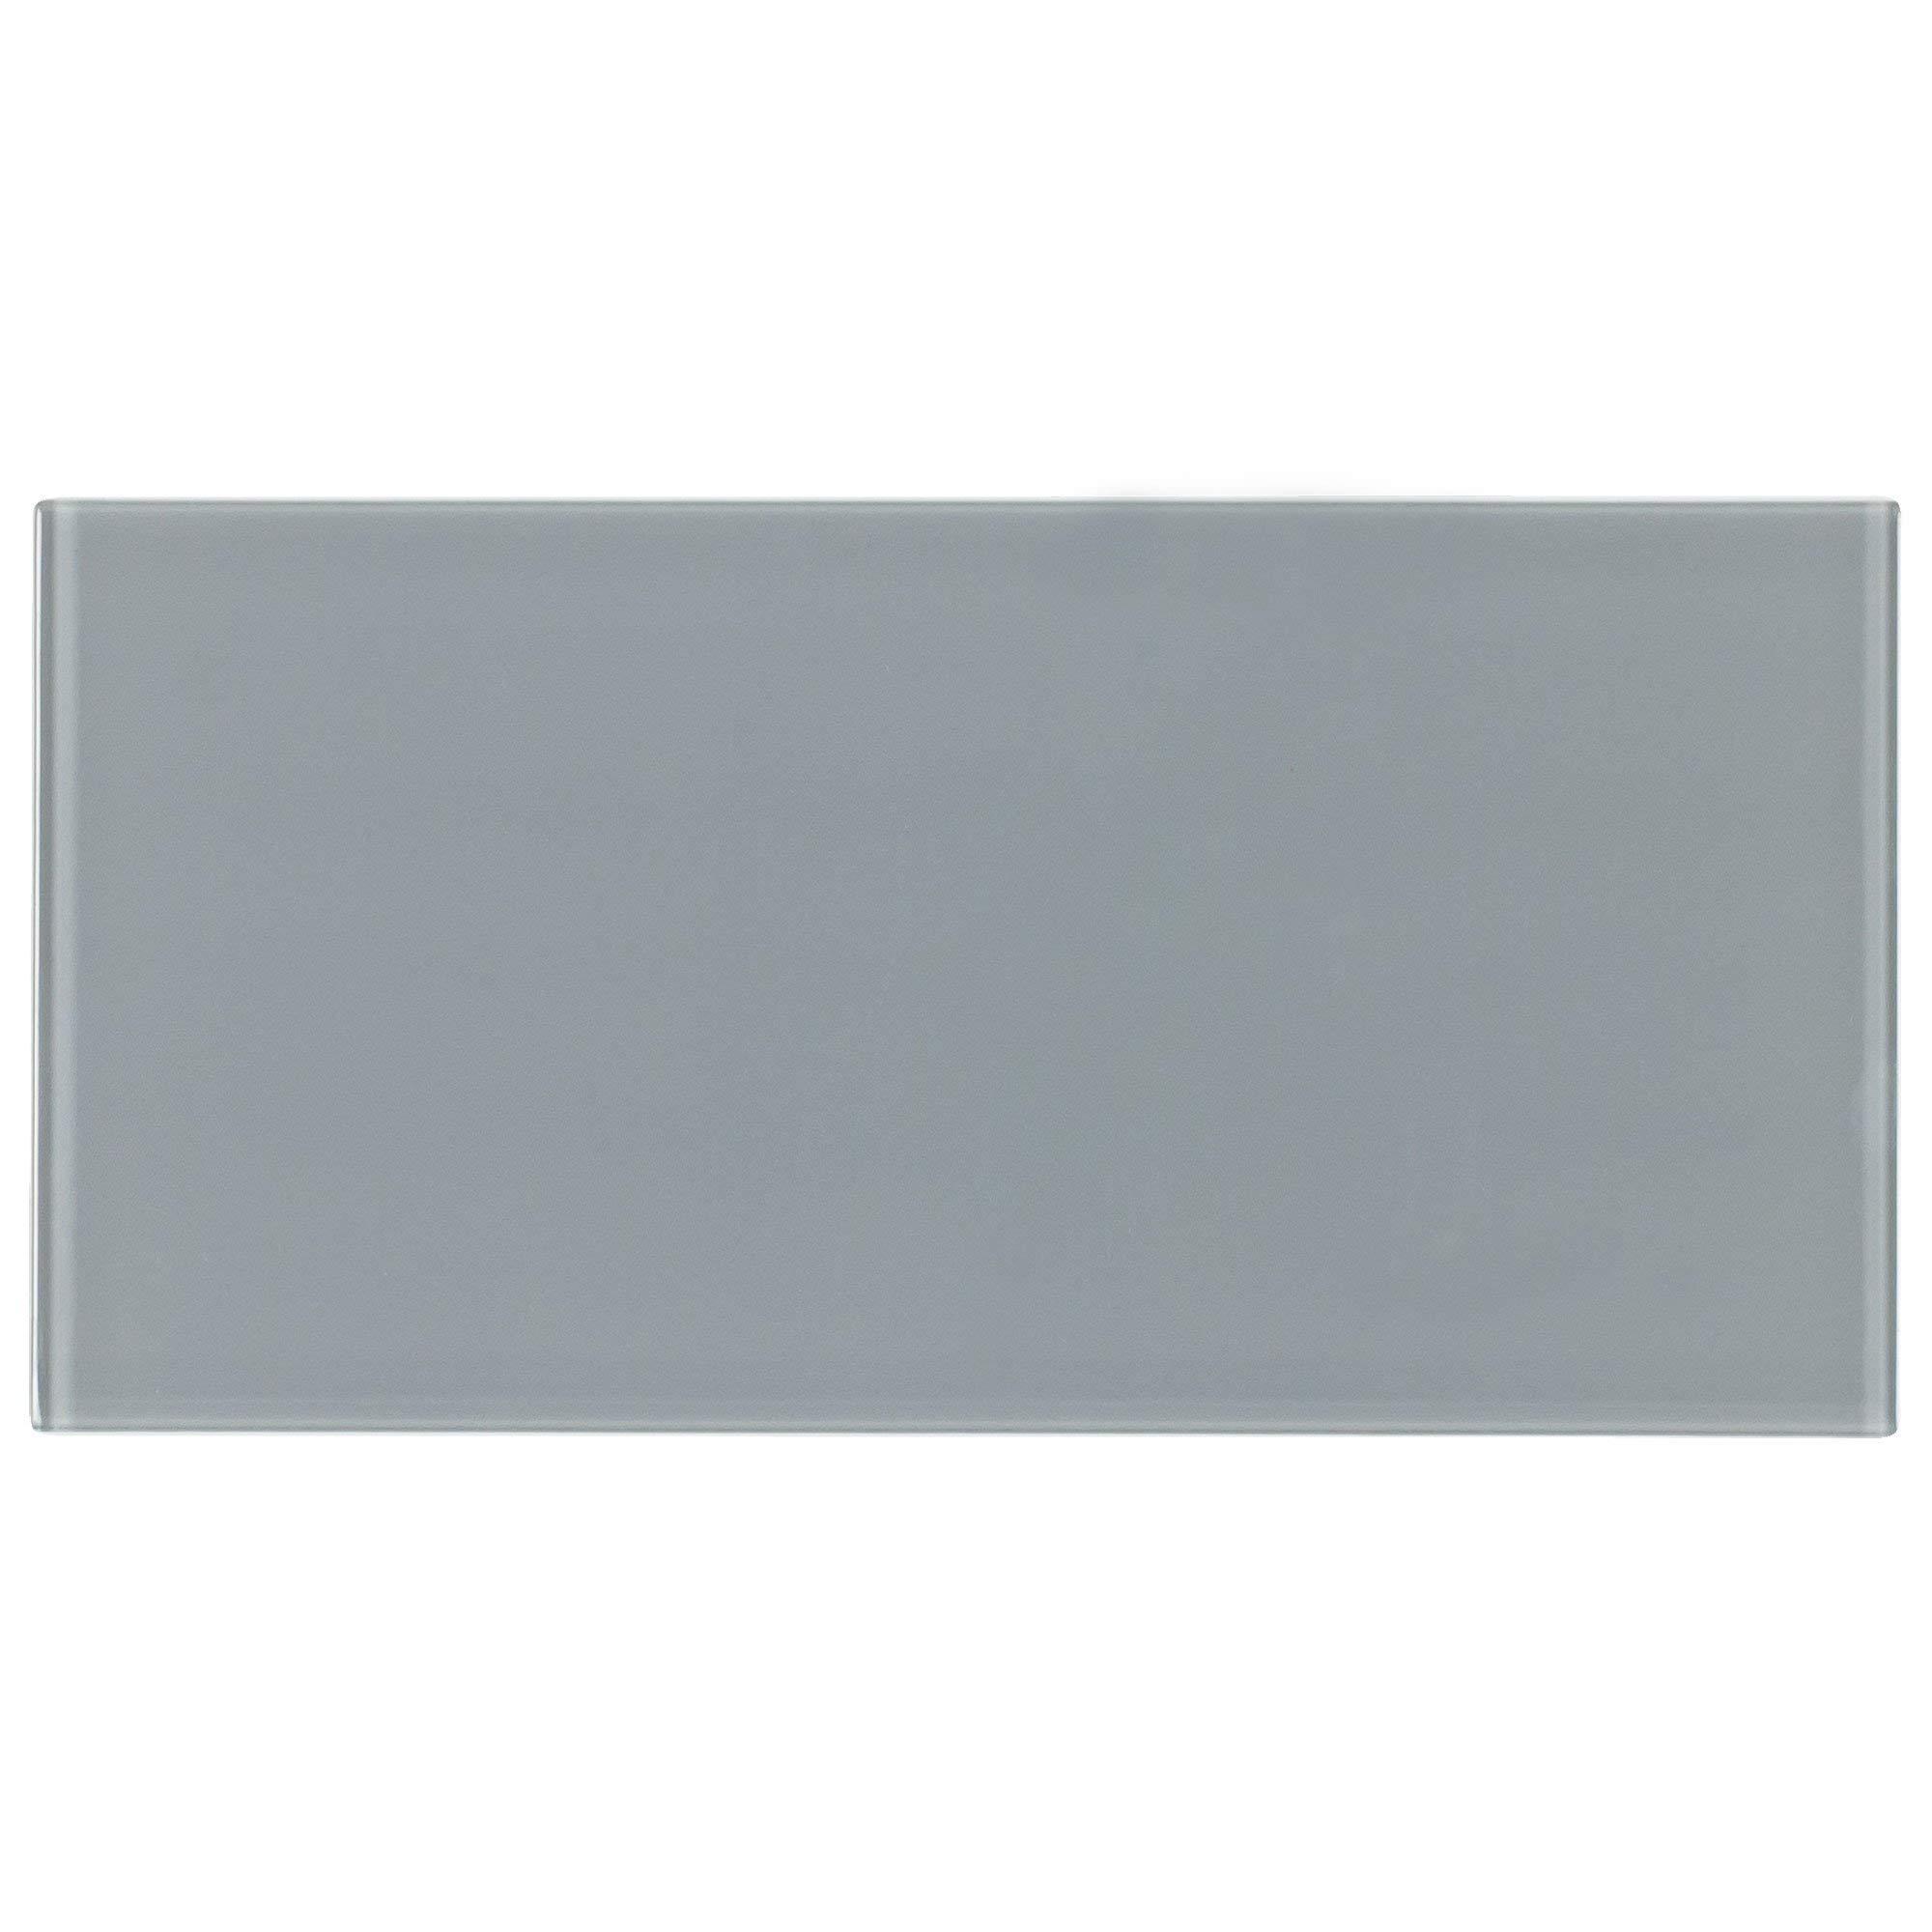 MTO0299 Classic Subway Brick Gray Glossy Glass Tile